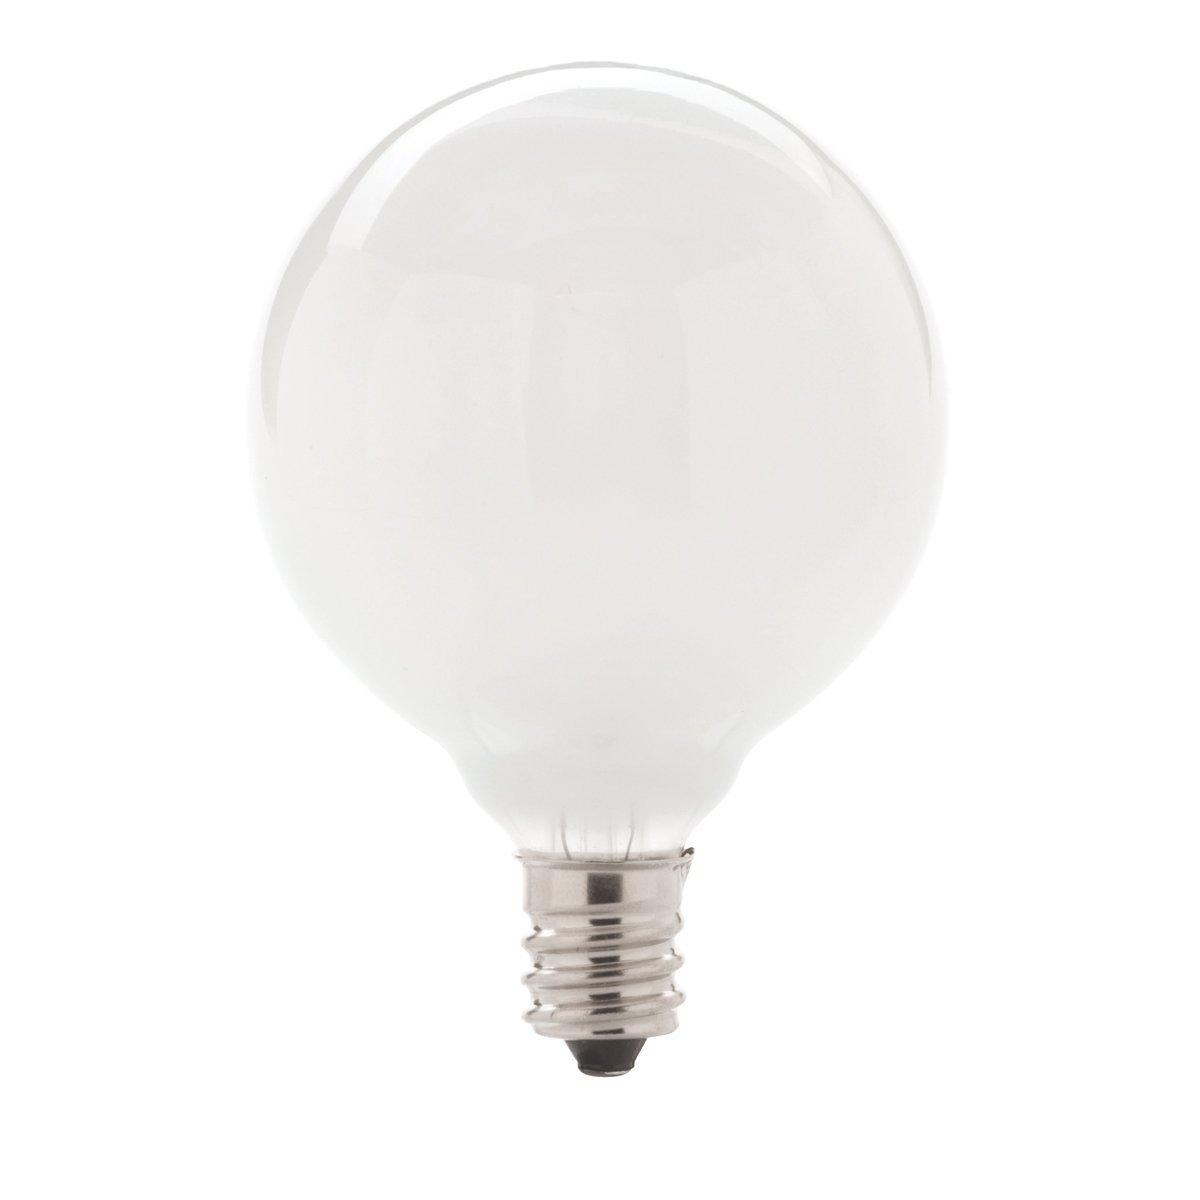 40-watt G16.5 Decorative Globe E12 Candelabra Base Light